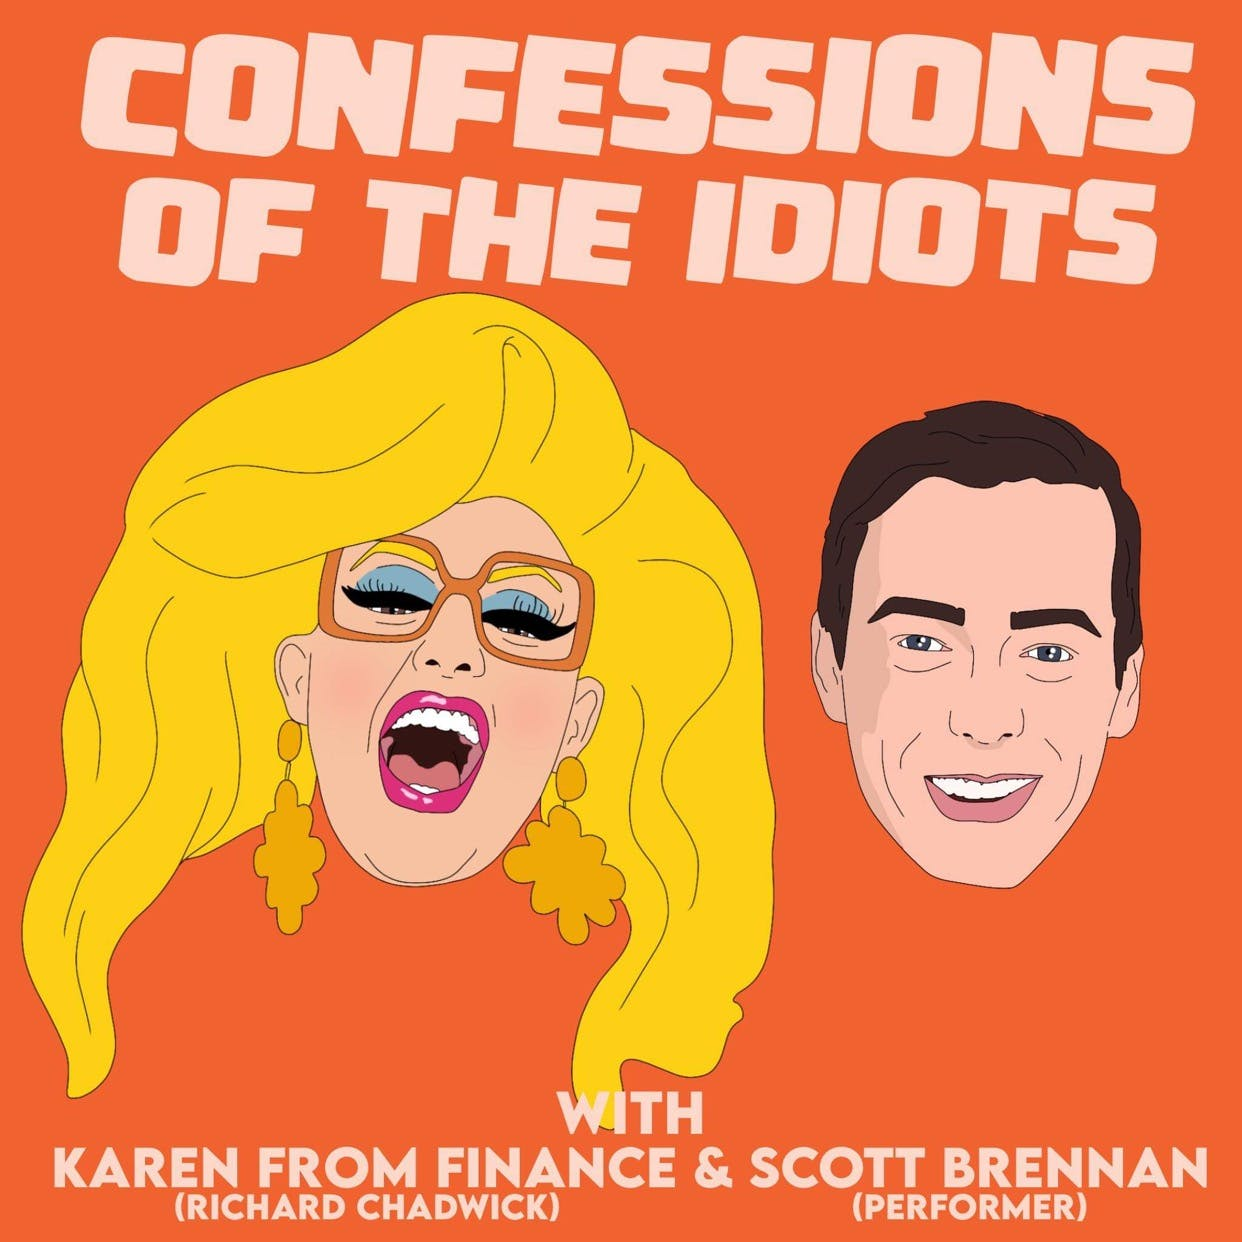 Karen From Finance (Richard Chadwick) & Scott Brennan